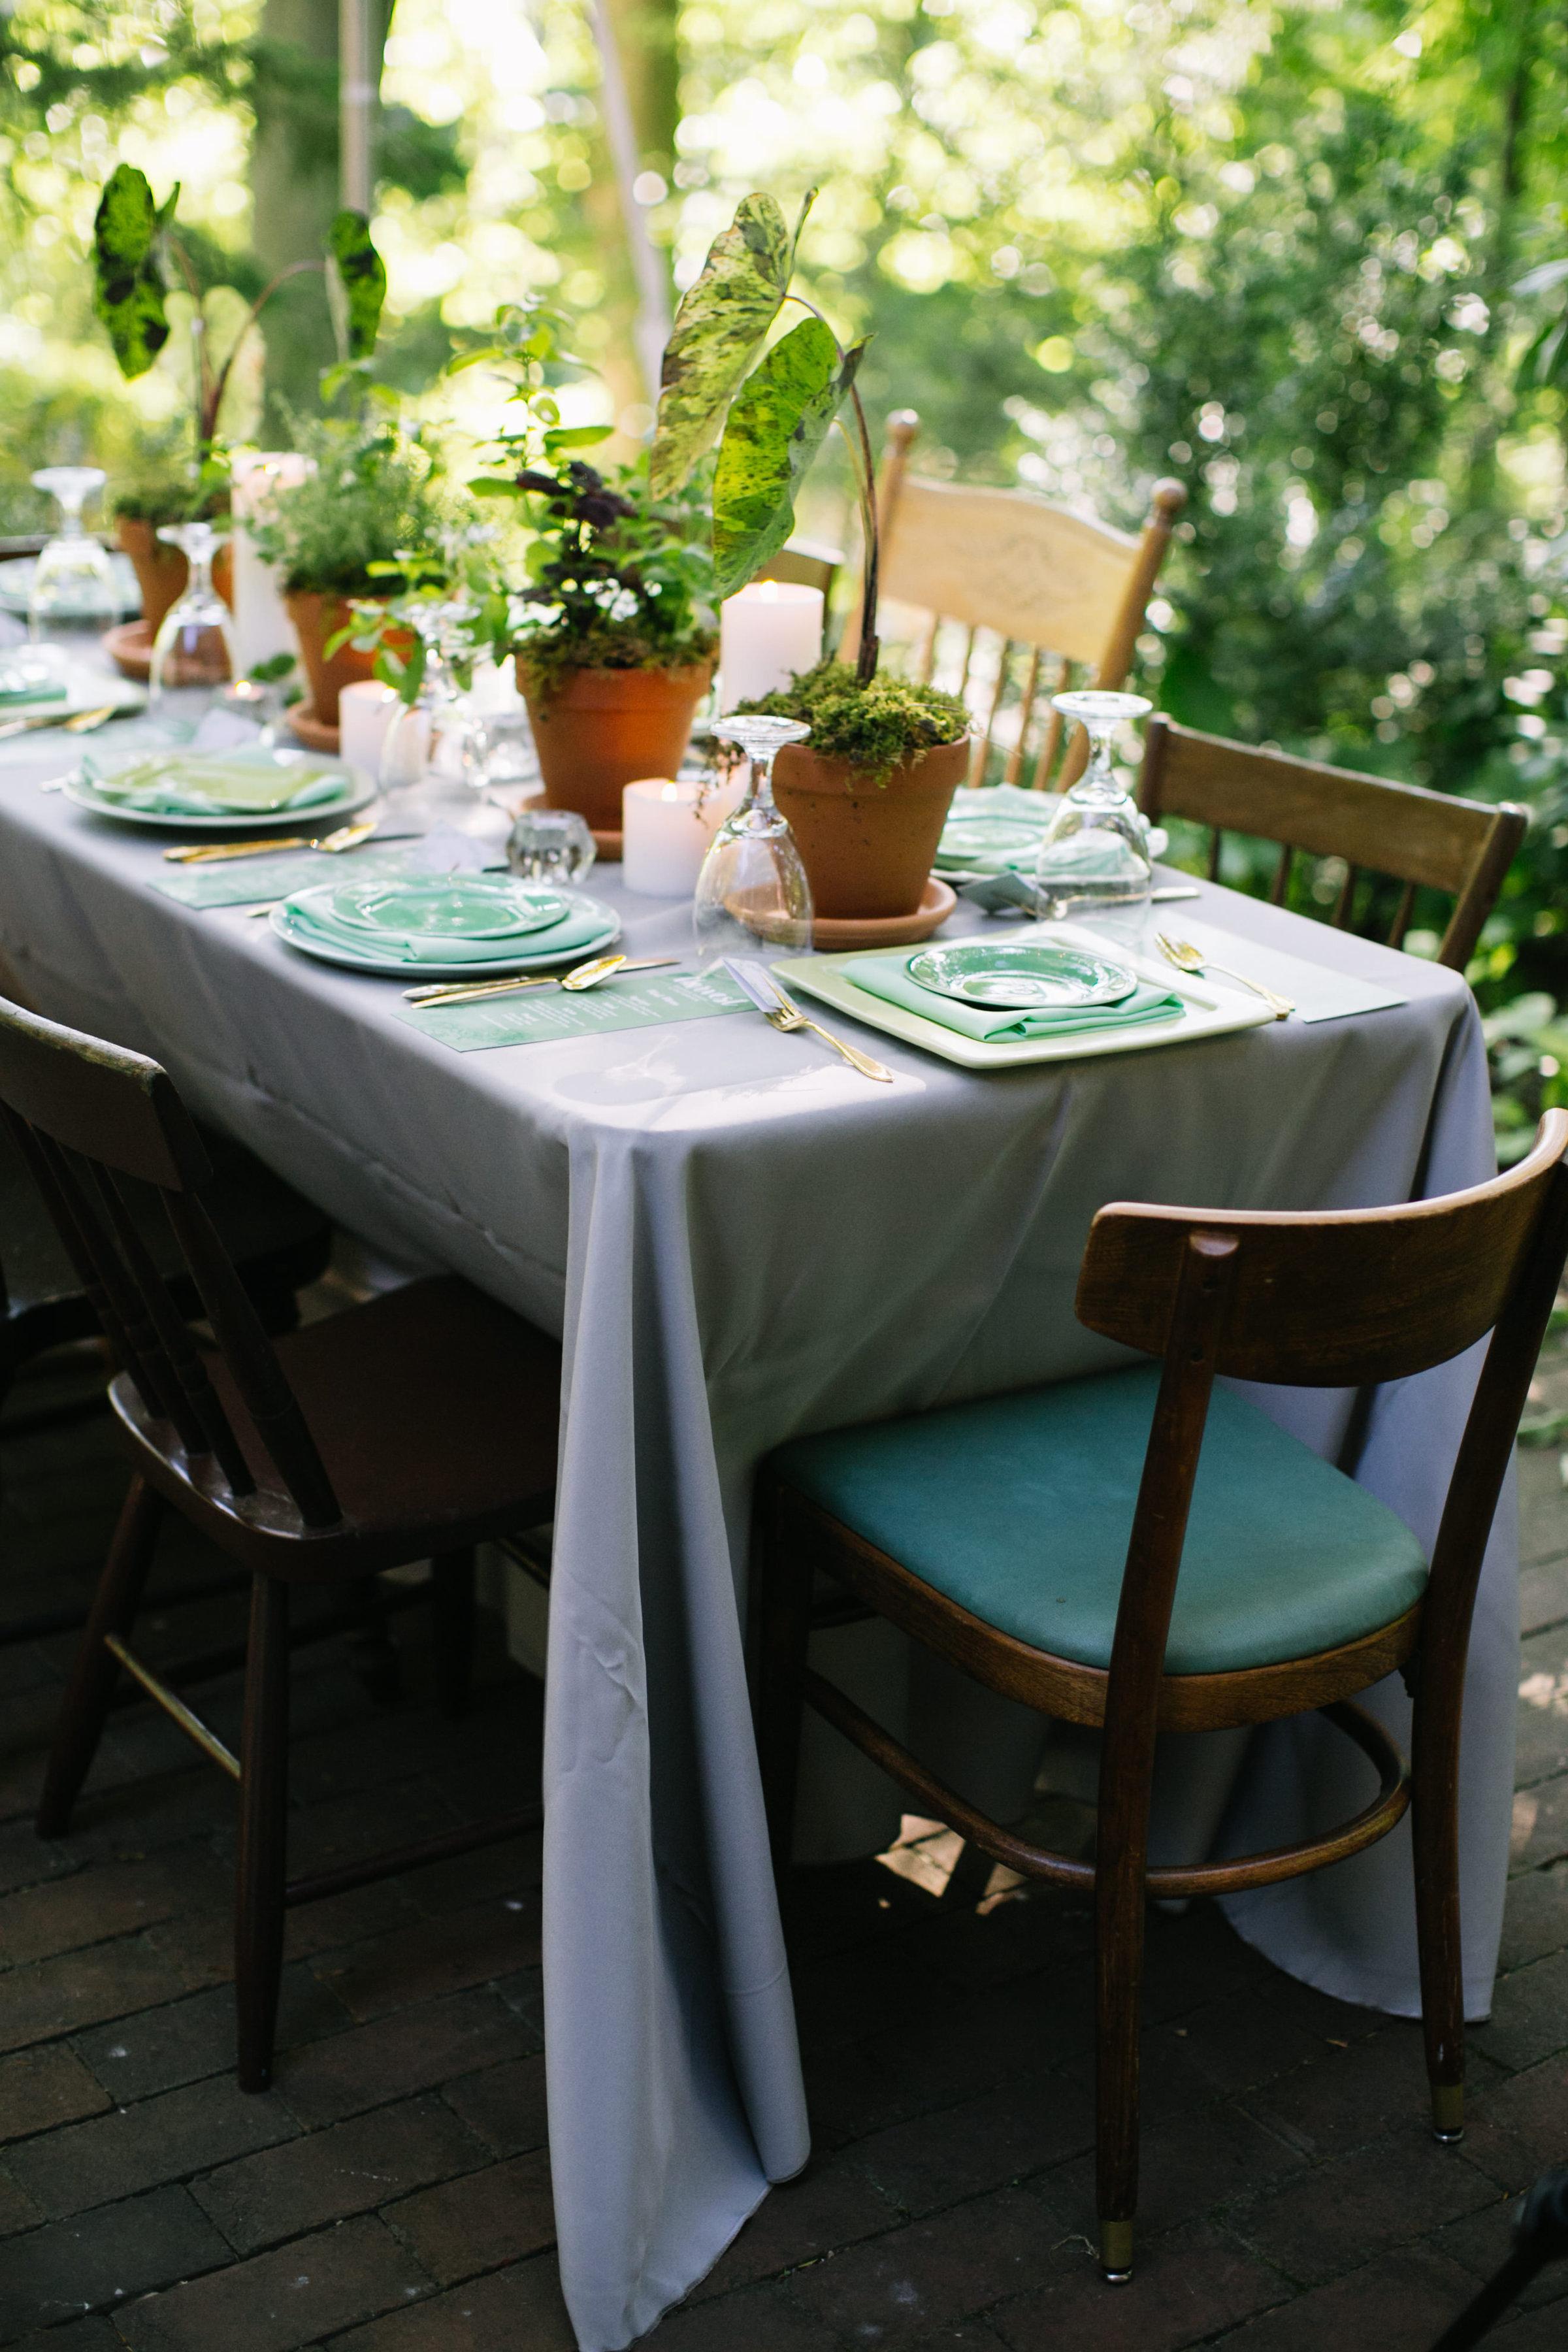 West-Chester-PA-Faunbrook-Harvest-Dinner-Series-Mint-BrittneyRaine-50.JPG